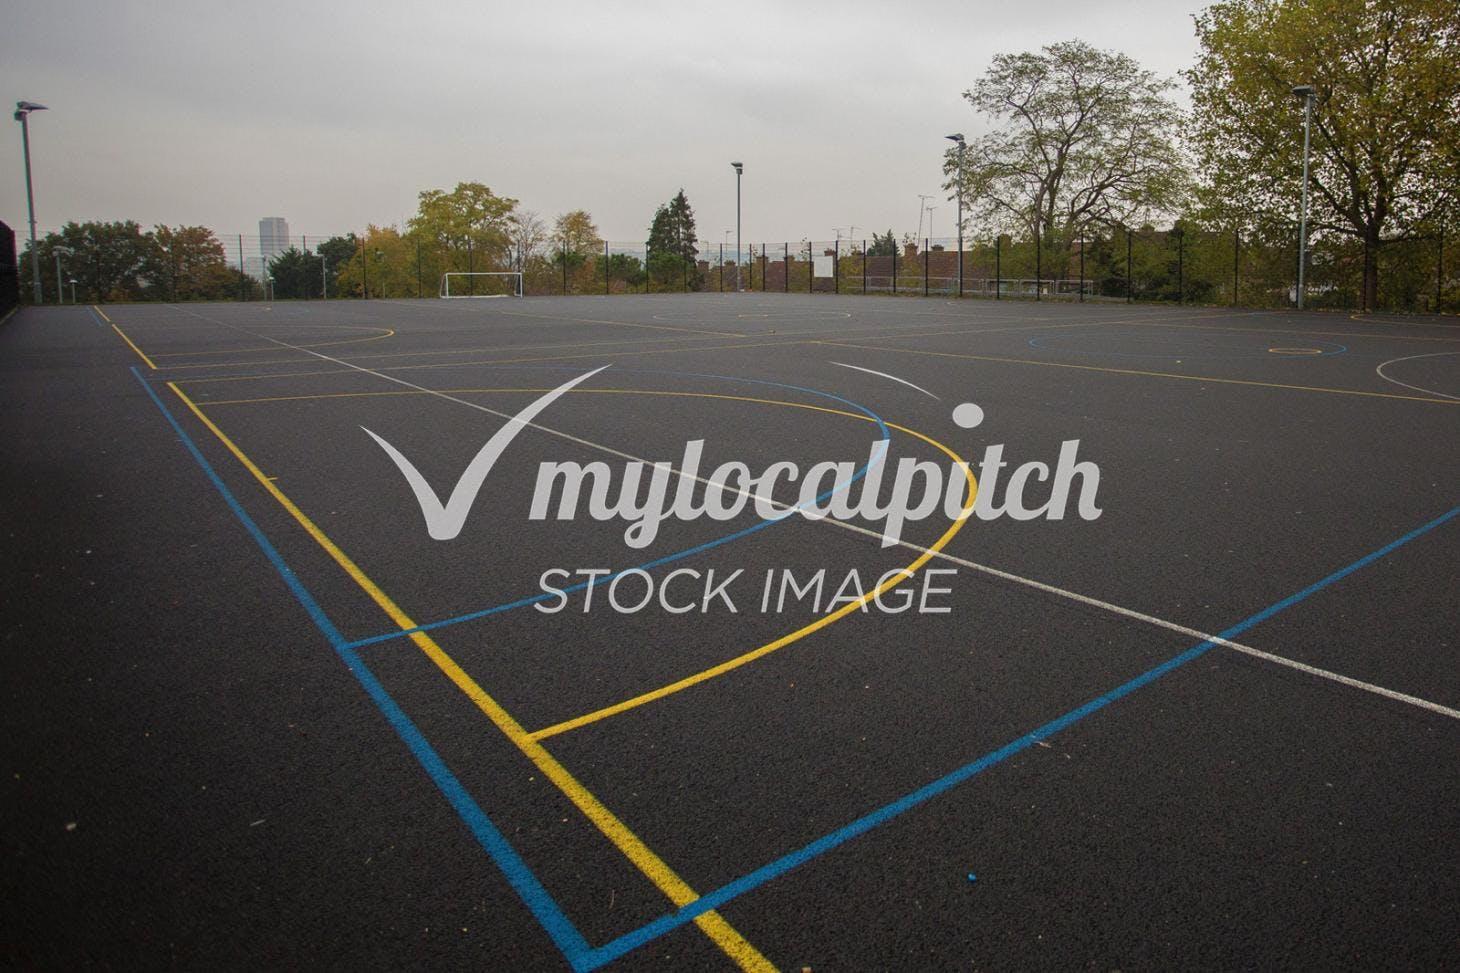 Downhills Park 5 a side | Concrete football pitch